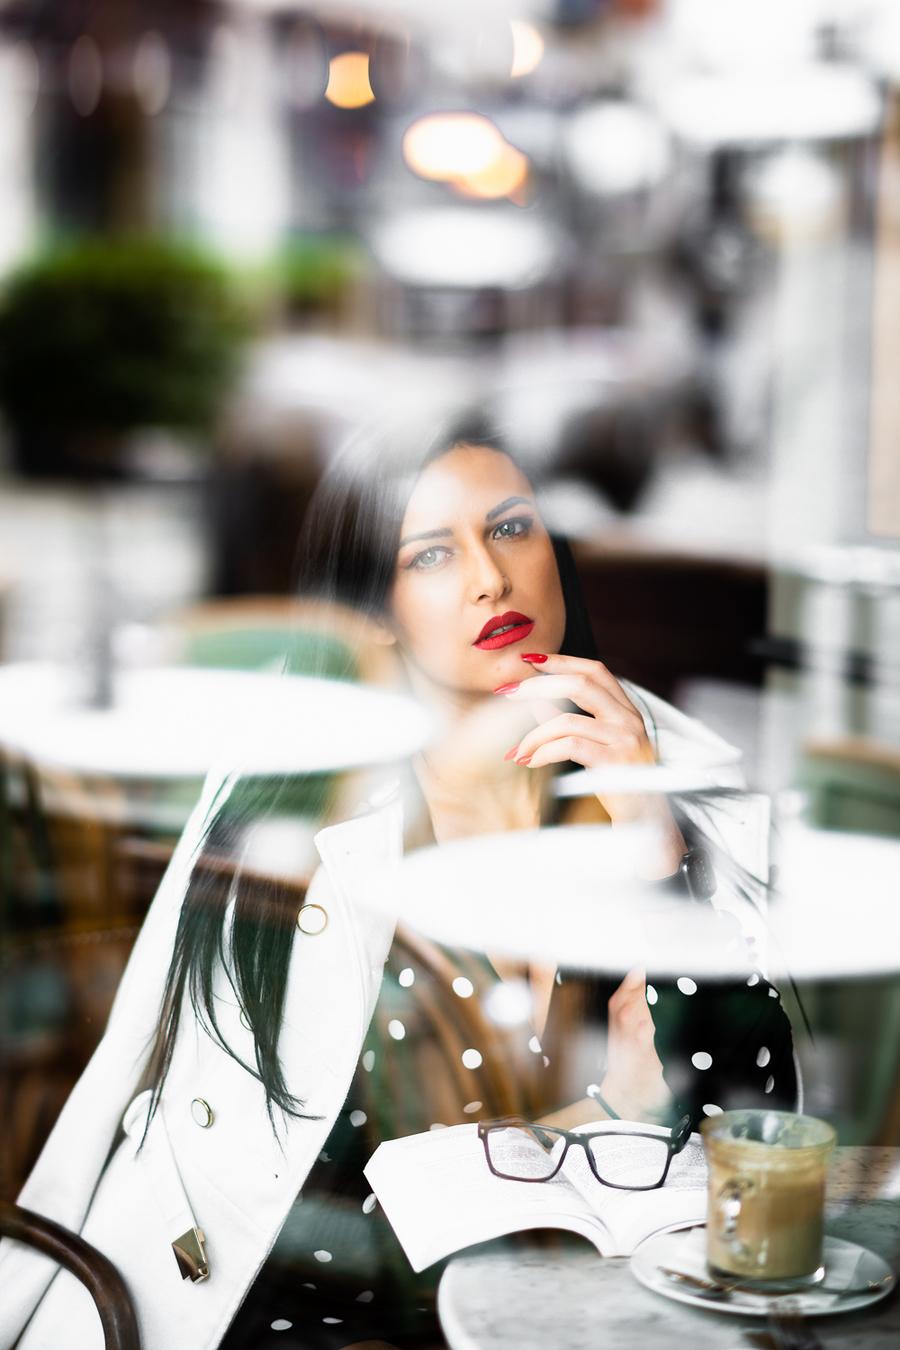 Dreaming / Photography by SkibinskiPhotography, Model Mati Matilda, Makeup by Mati Matilda, Stylist Mati Matilda / Uploaded 18th May 2021 @ 10:19 PM